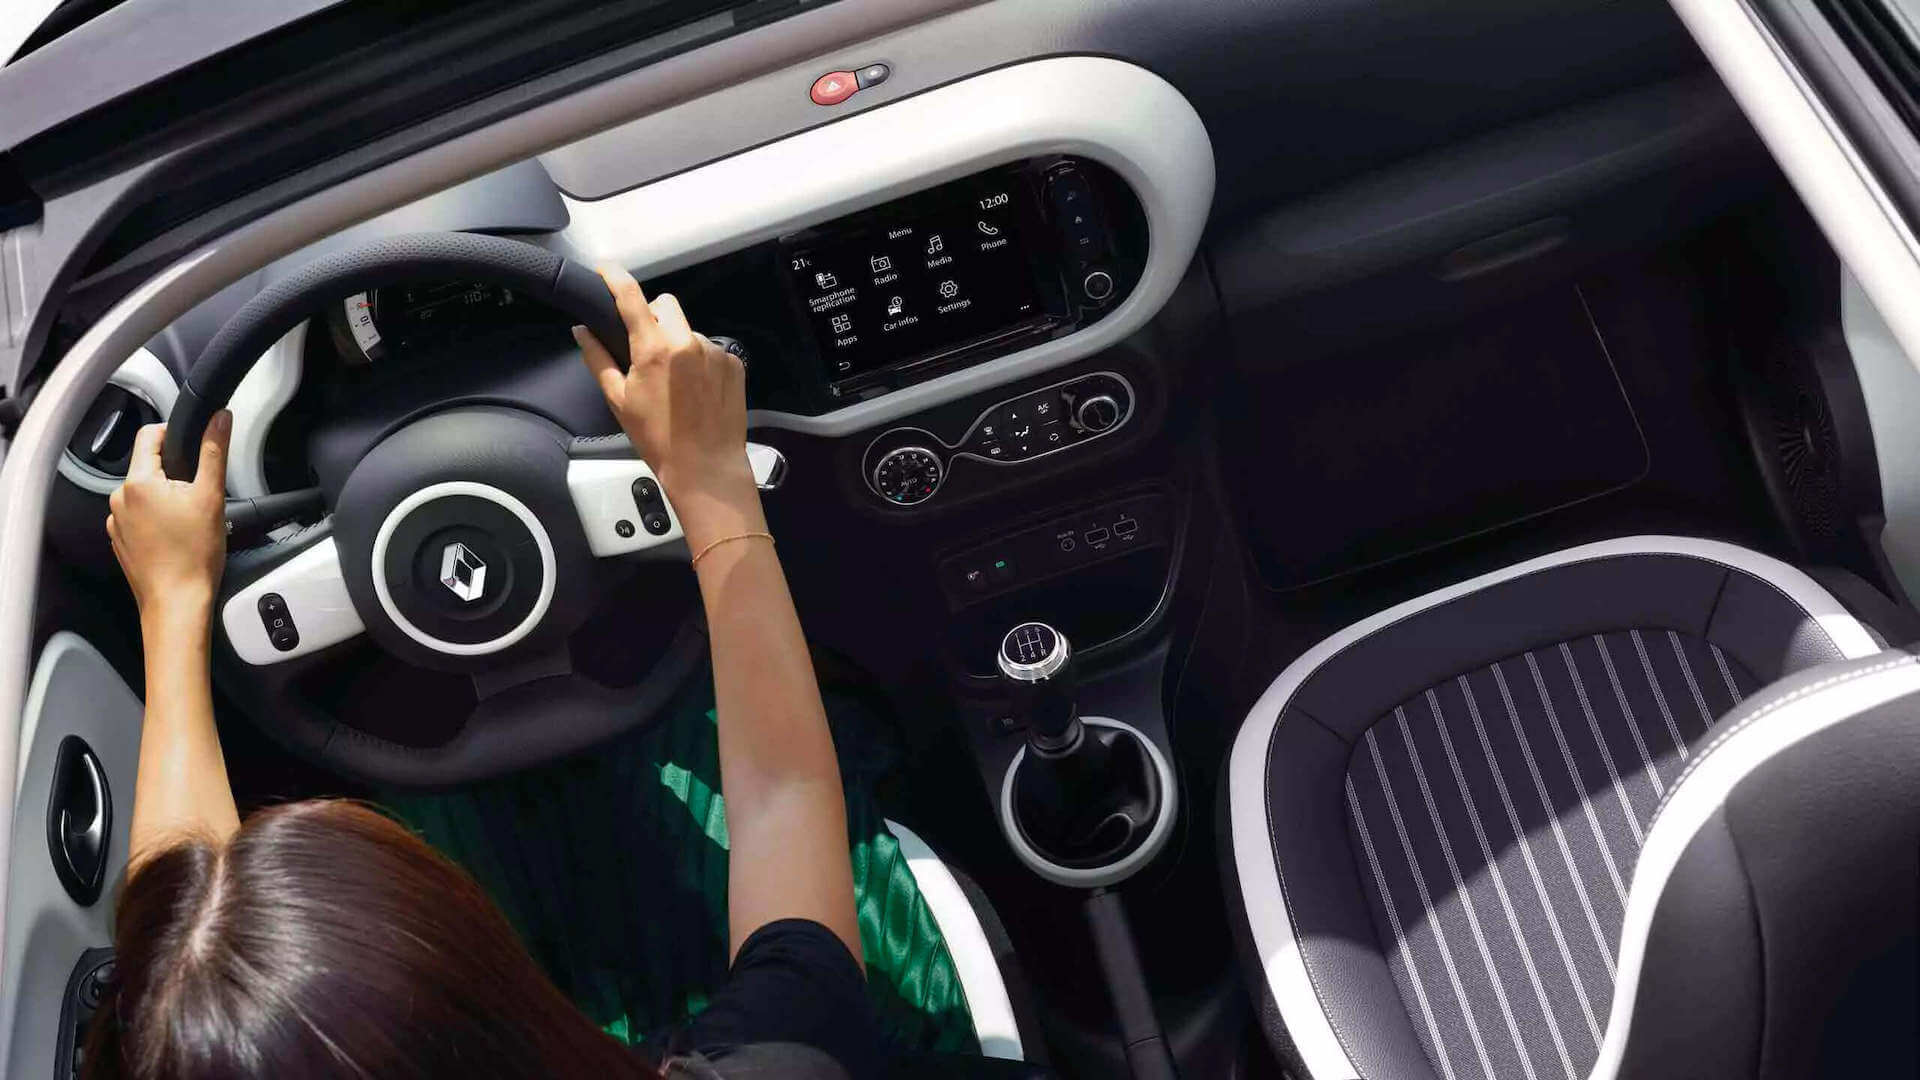 Cockpit - Frau am Steuer - orange - Renault Twingo - Renault Ahrens Hannover